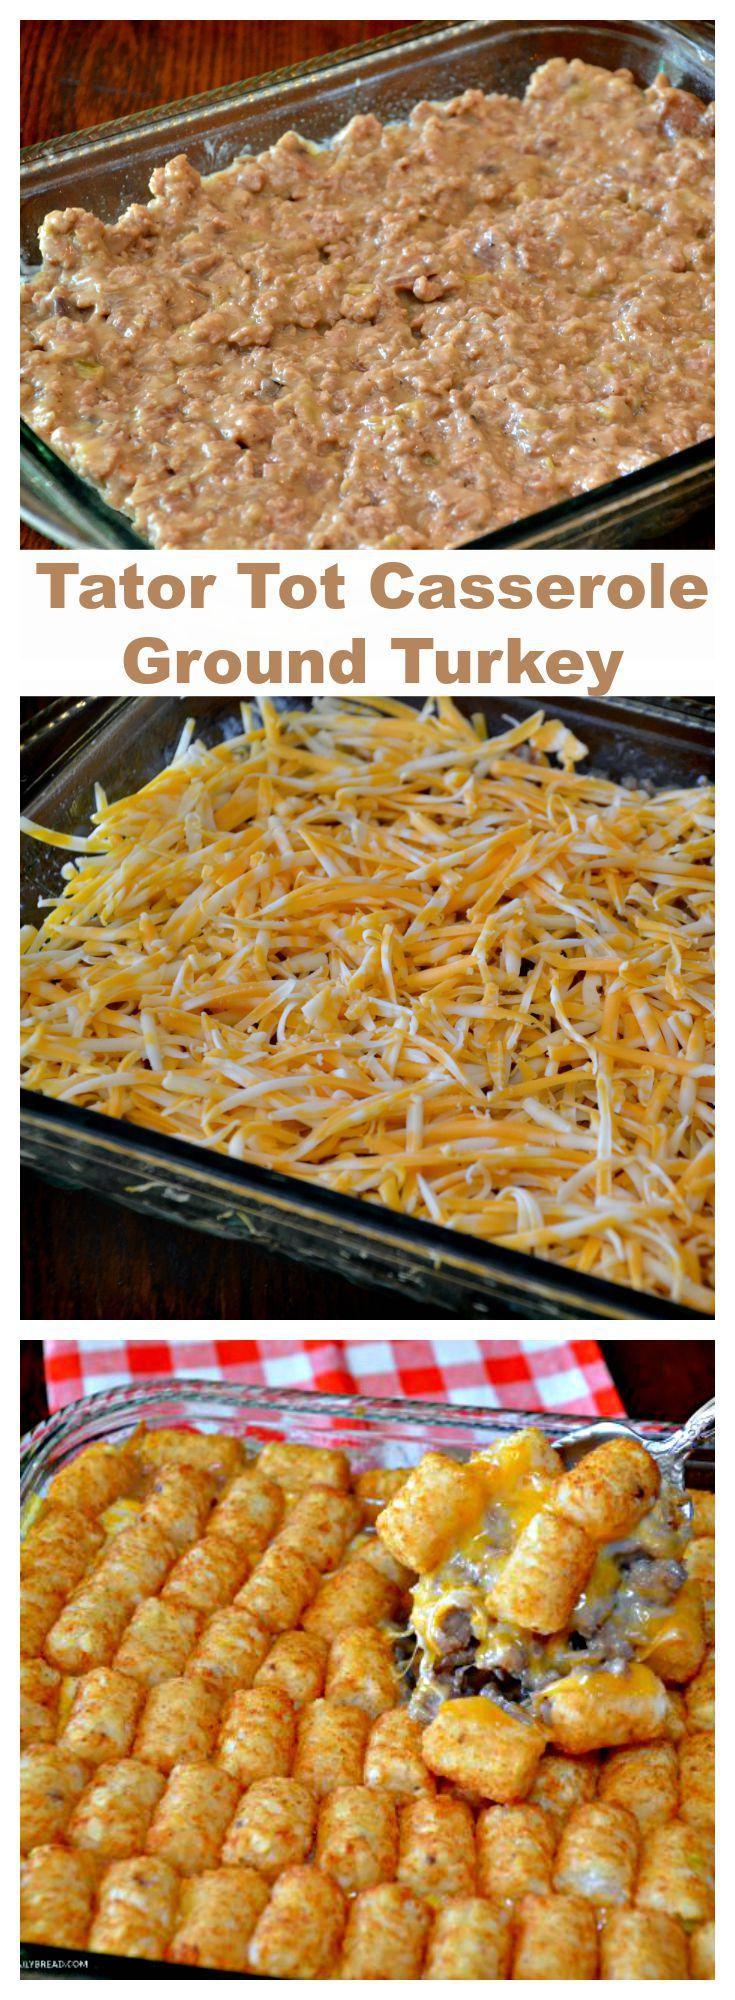 Ground Turkey Casserole Recipes Pasta